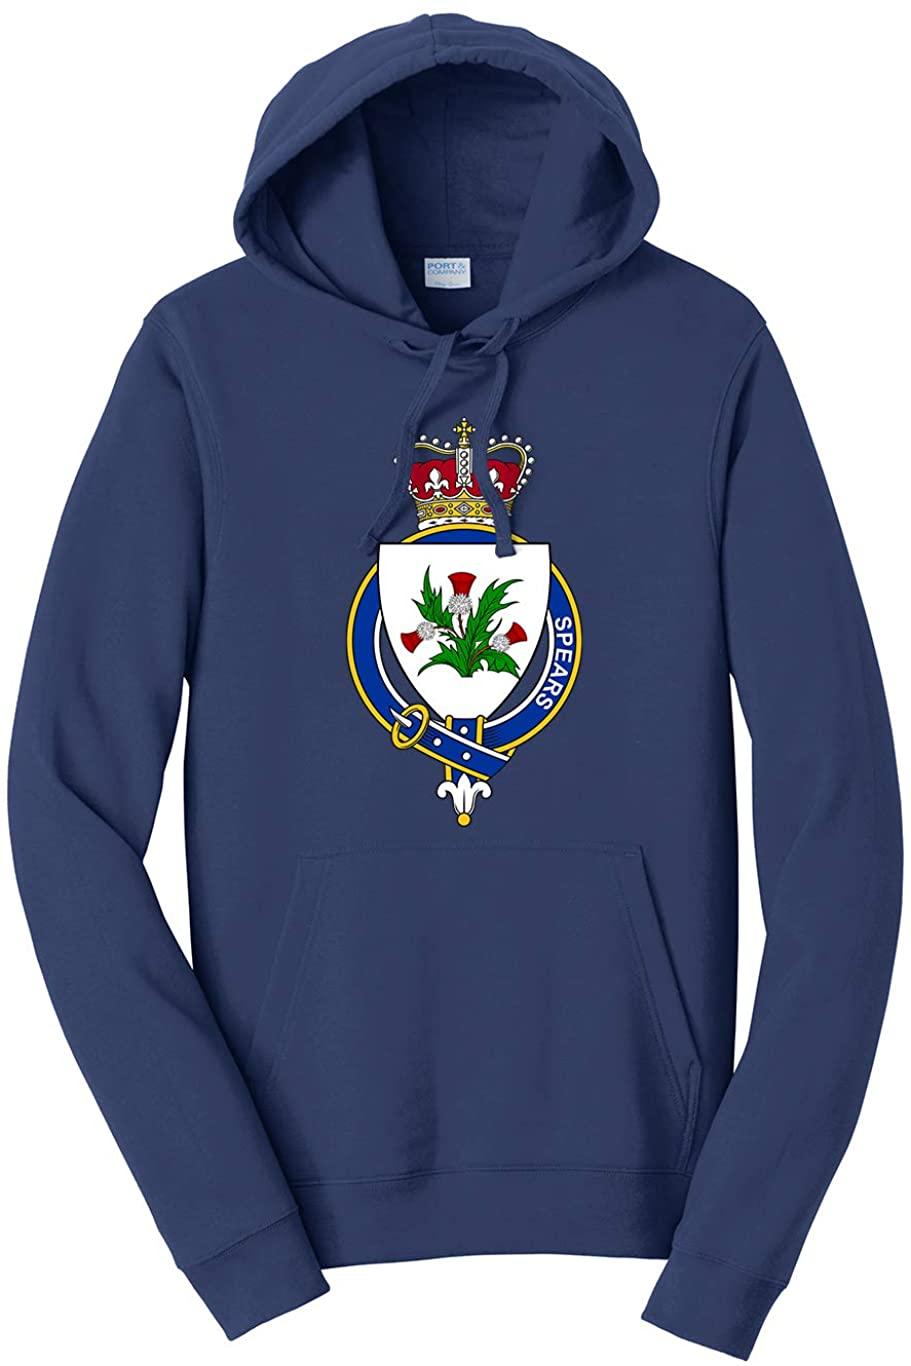 Tenacitee Unisex Scottish Garter Family Spears Hooded Sweatshirt